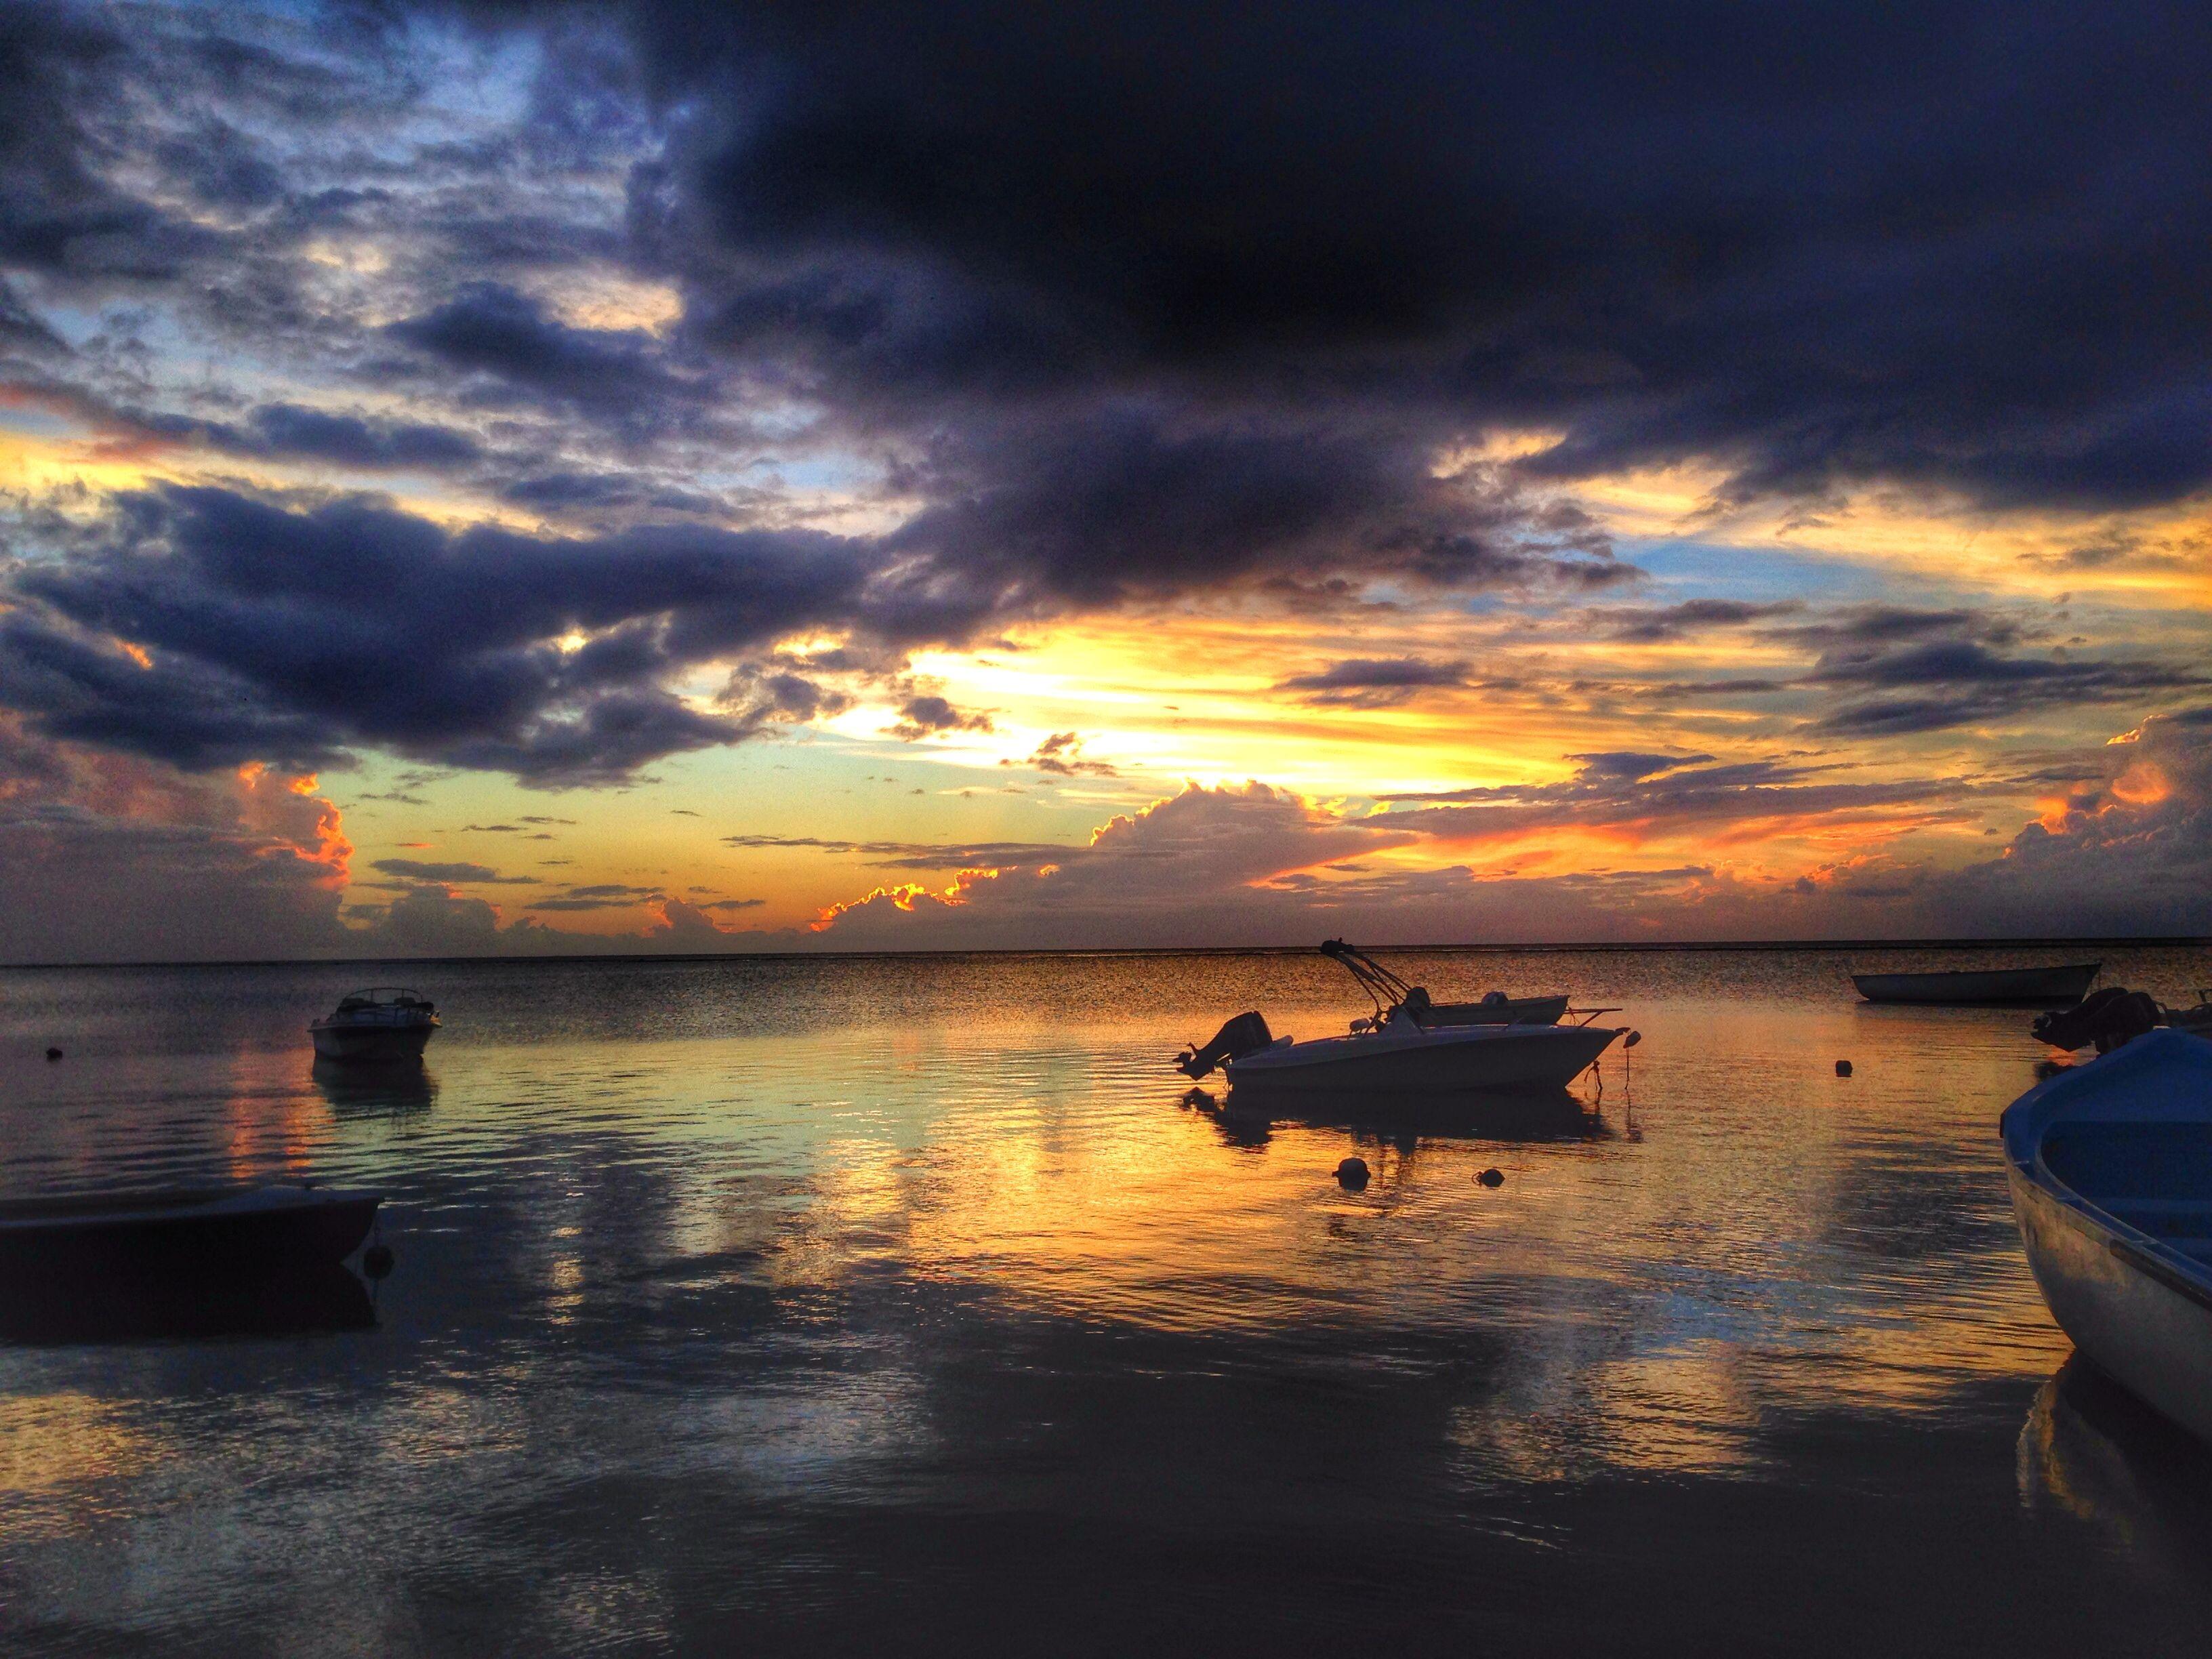 The Bay Mauritius sundowner | The Bay - Sunrises & Sundowners ...